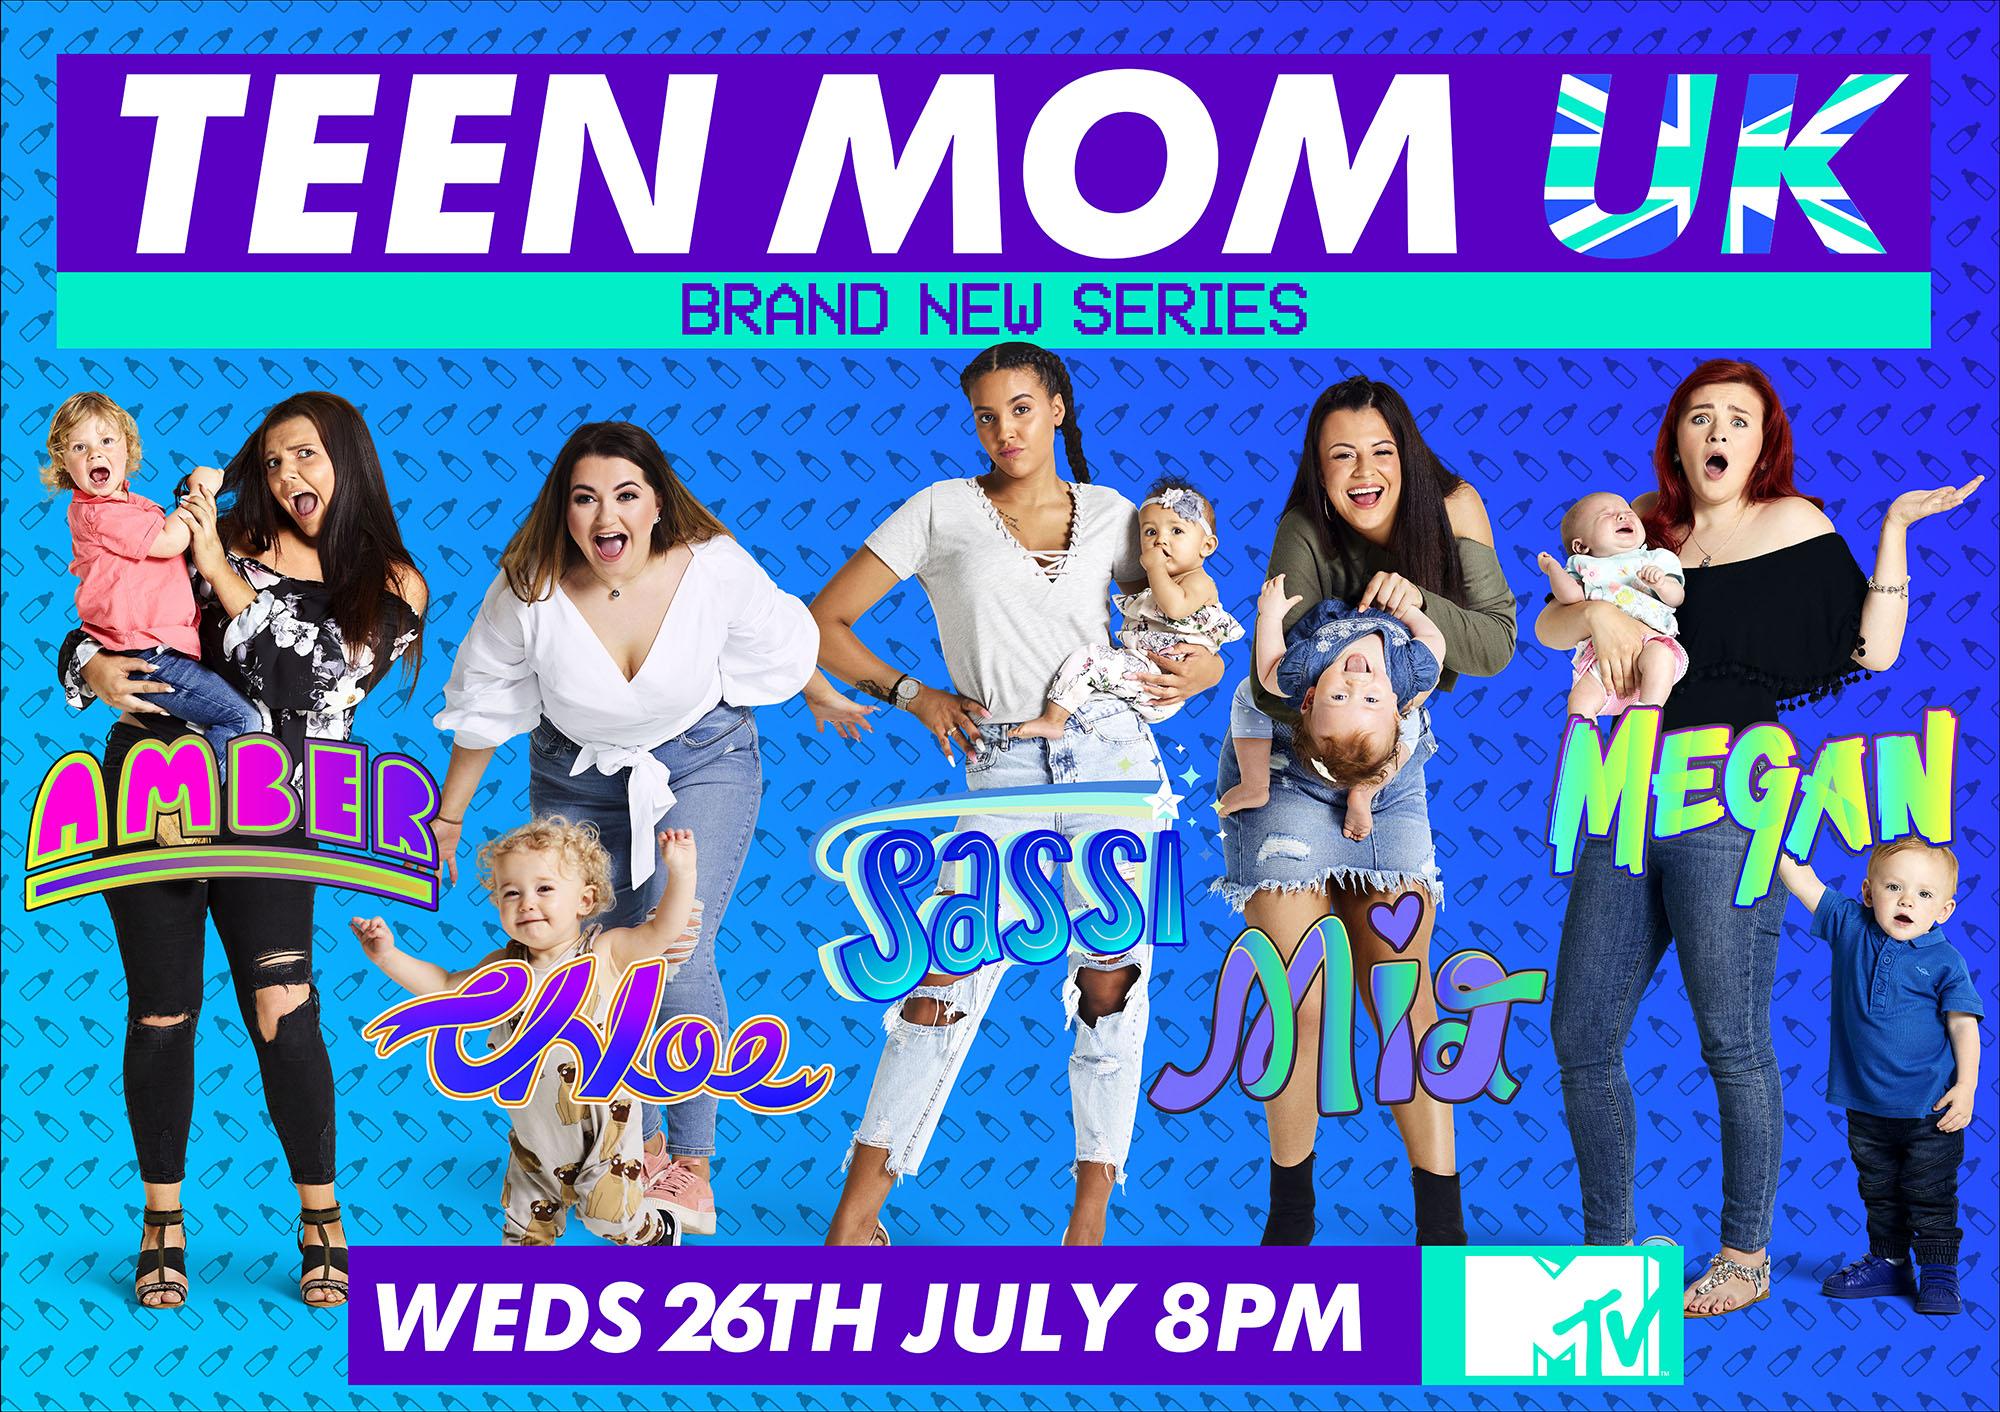 MTV's Teen MOM UK Key Art Campaign